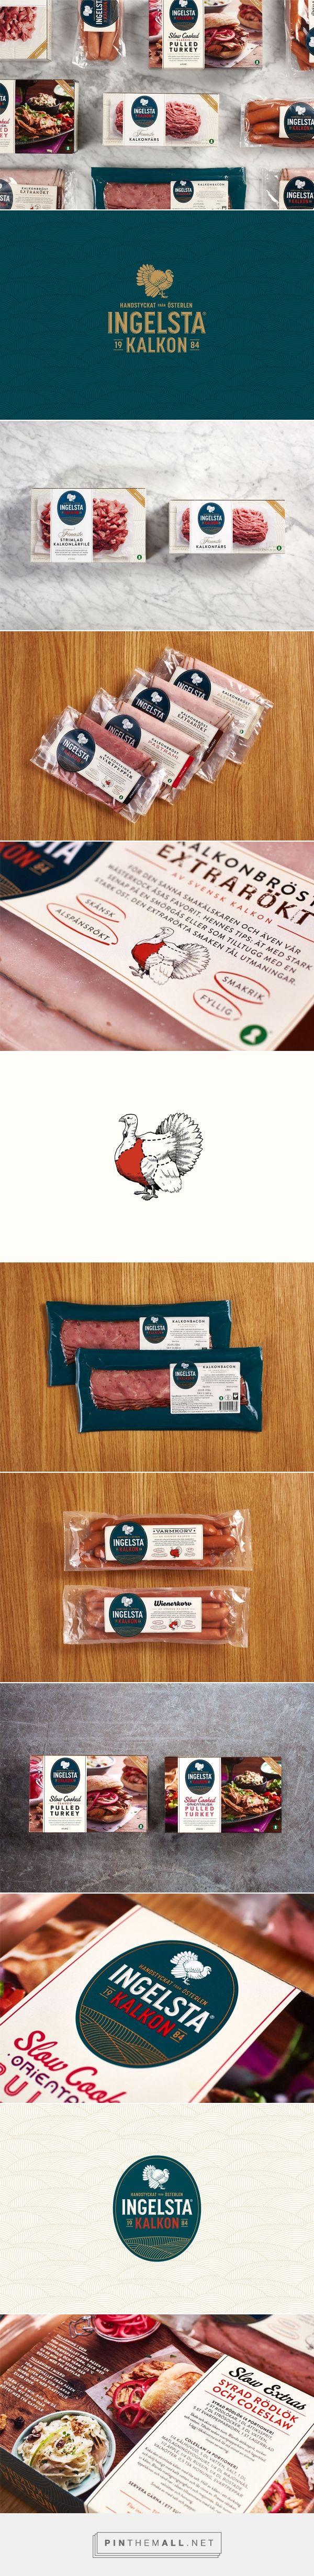 Ingelsta Kalkon meat packaging design by Amore Brand Identity Studios (Sweden) - http://www.packagingoftheworld.com/2016/07/ingelsta-kalkon.html